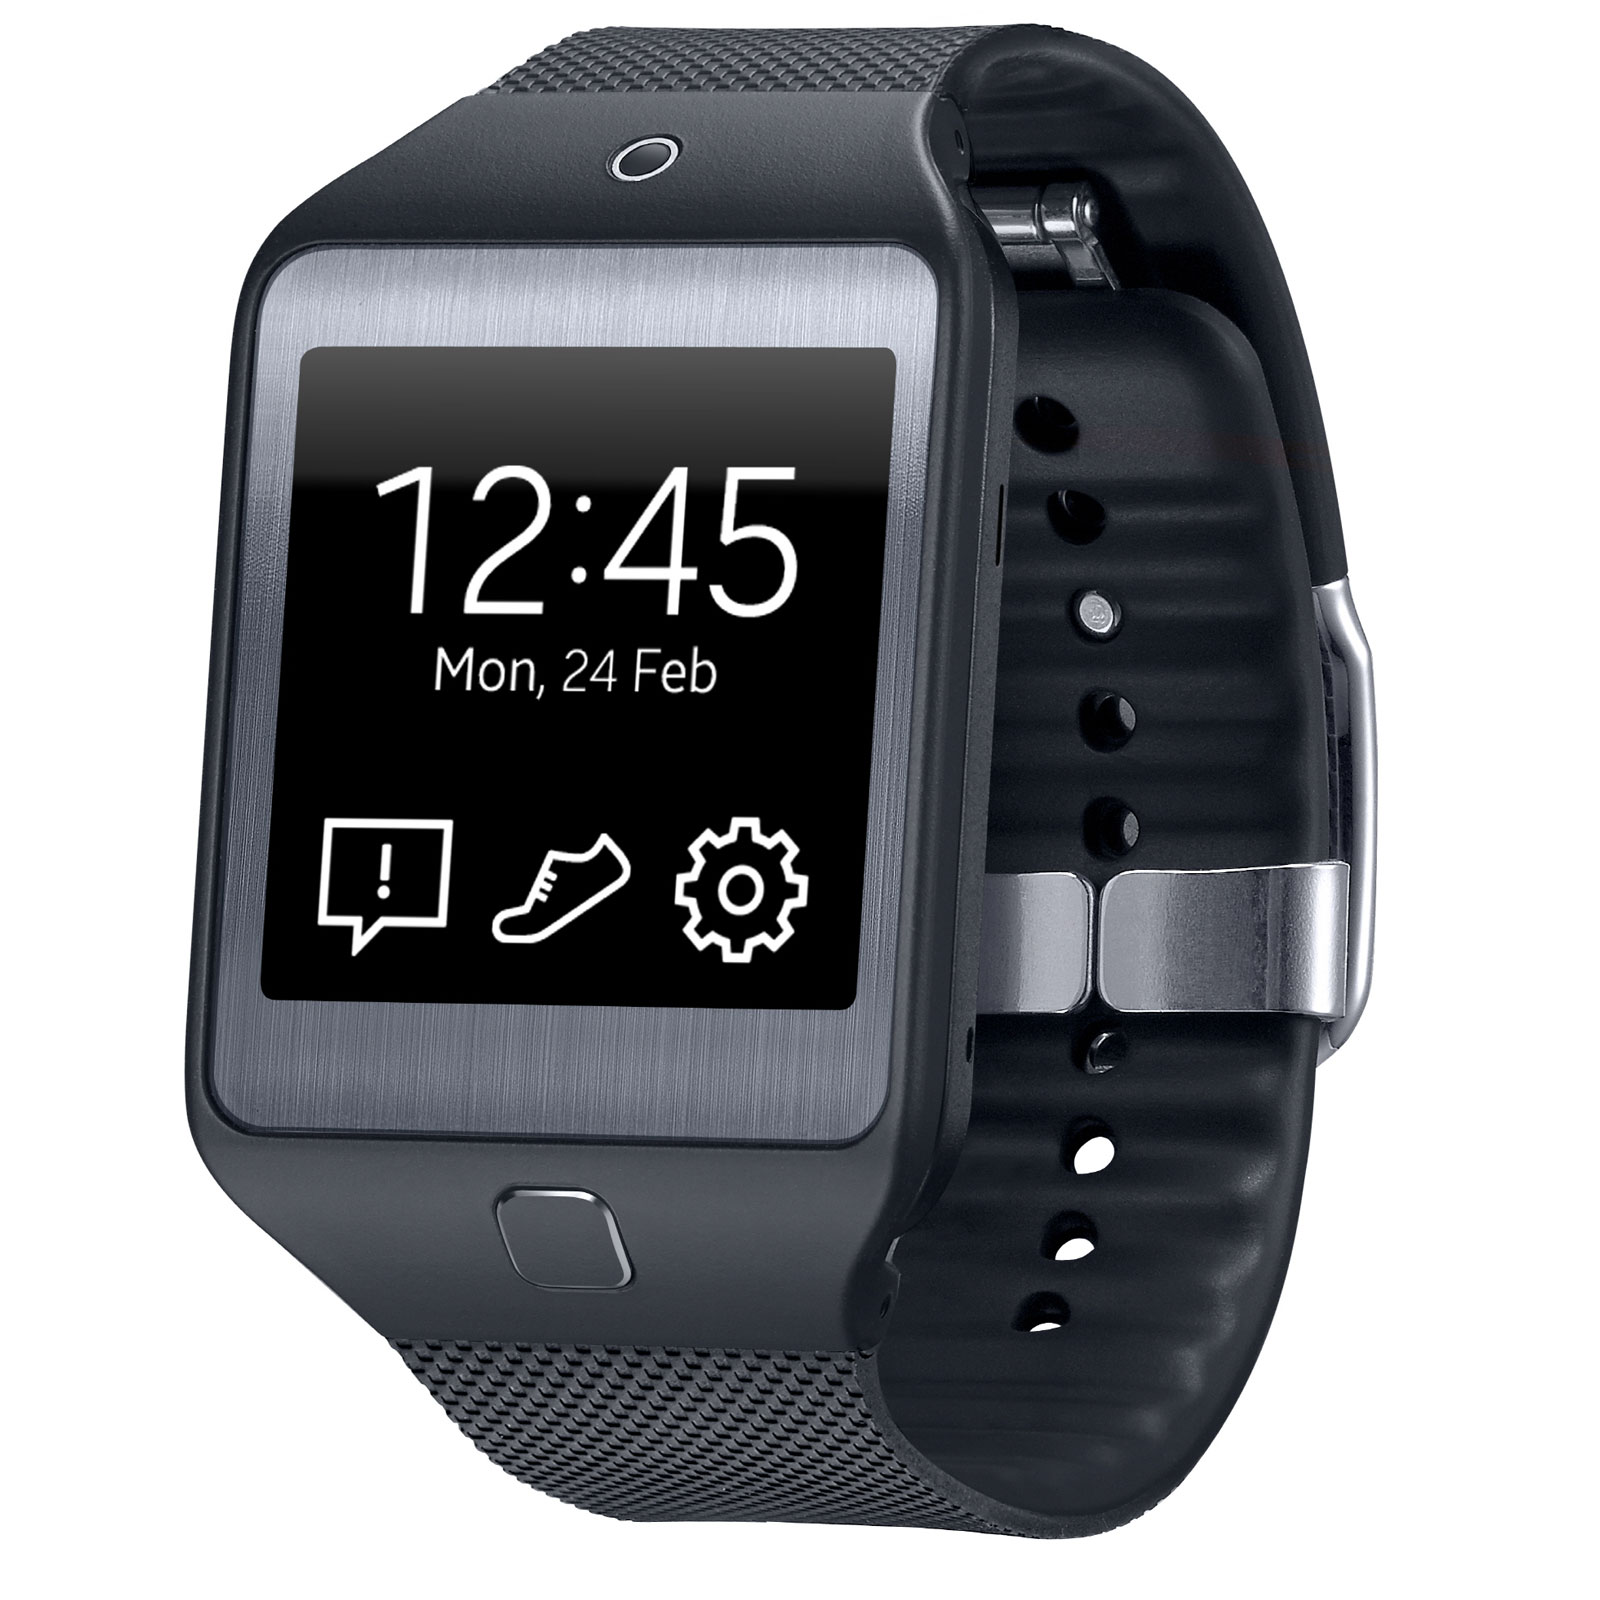 samsung galaxy gear 2 lite noir montre bracelets. Black Bedroom Furniture Sets. Home Design Ideas